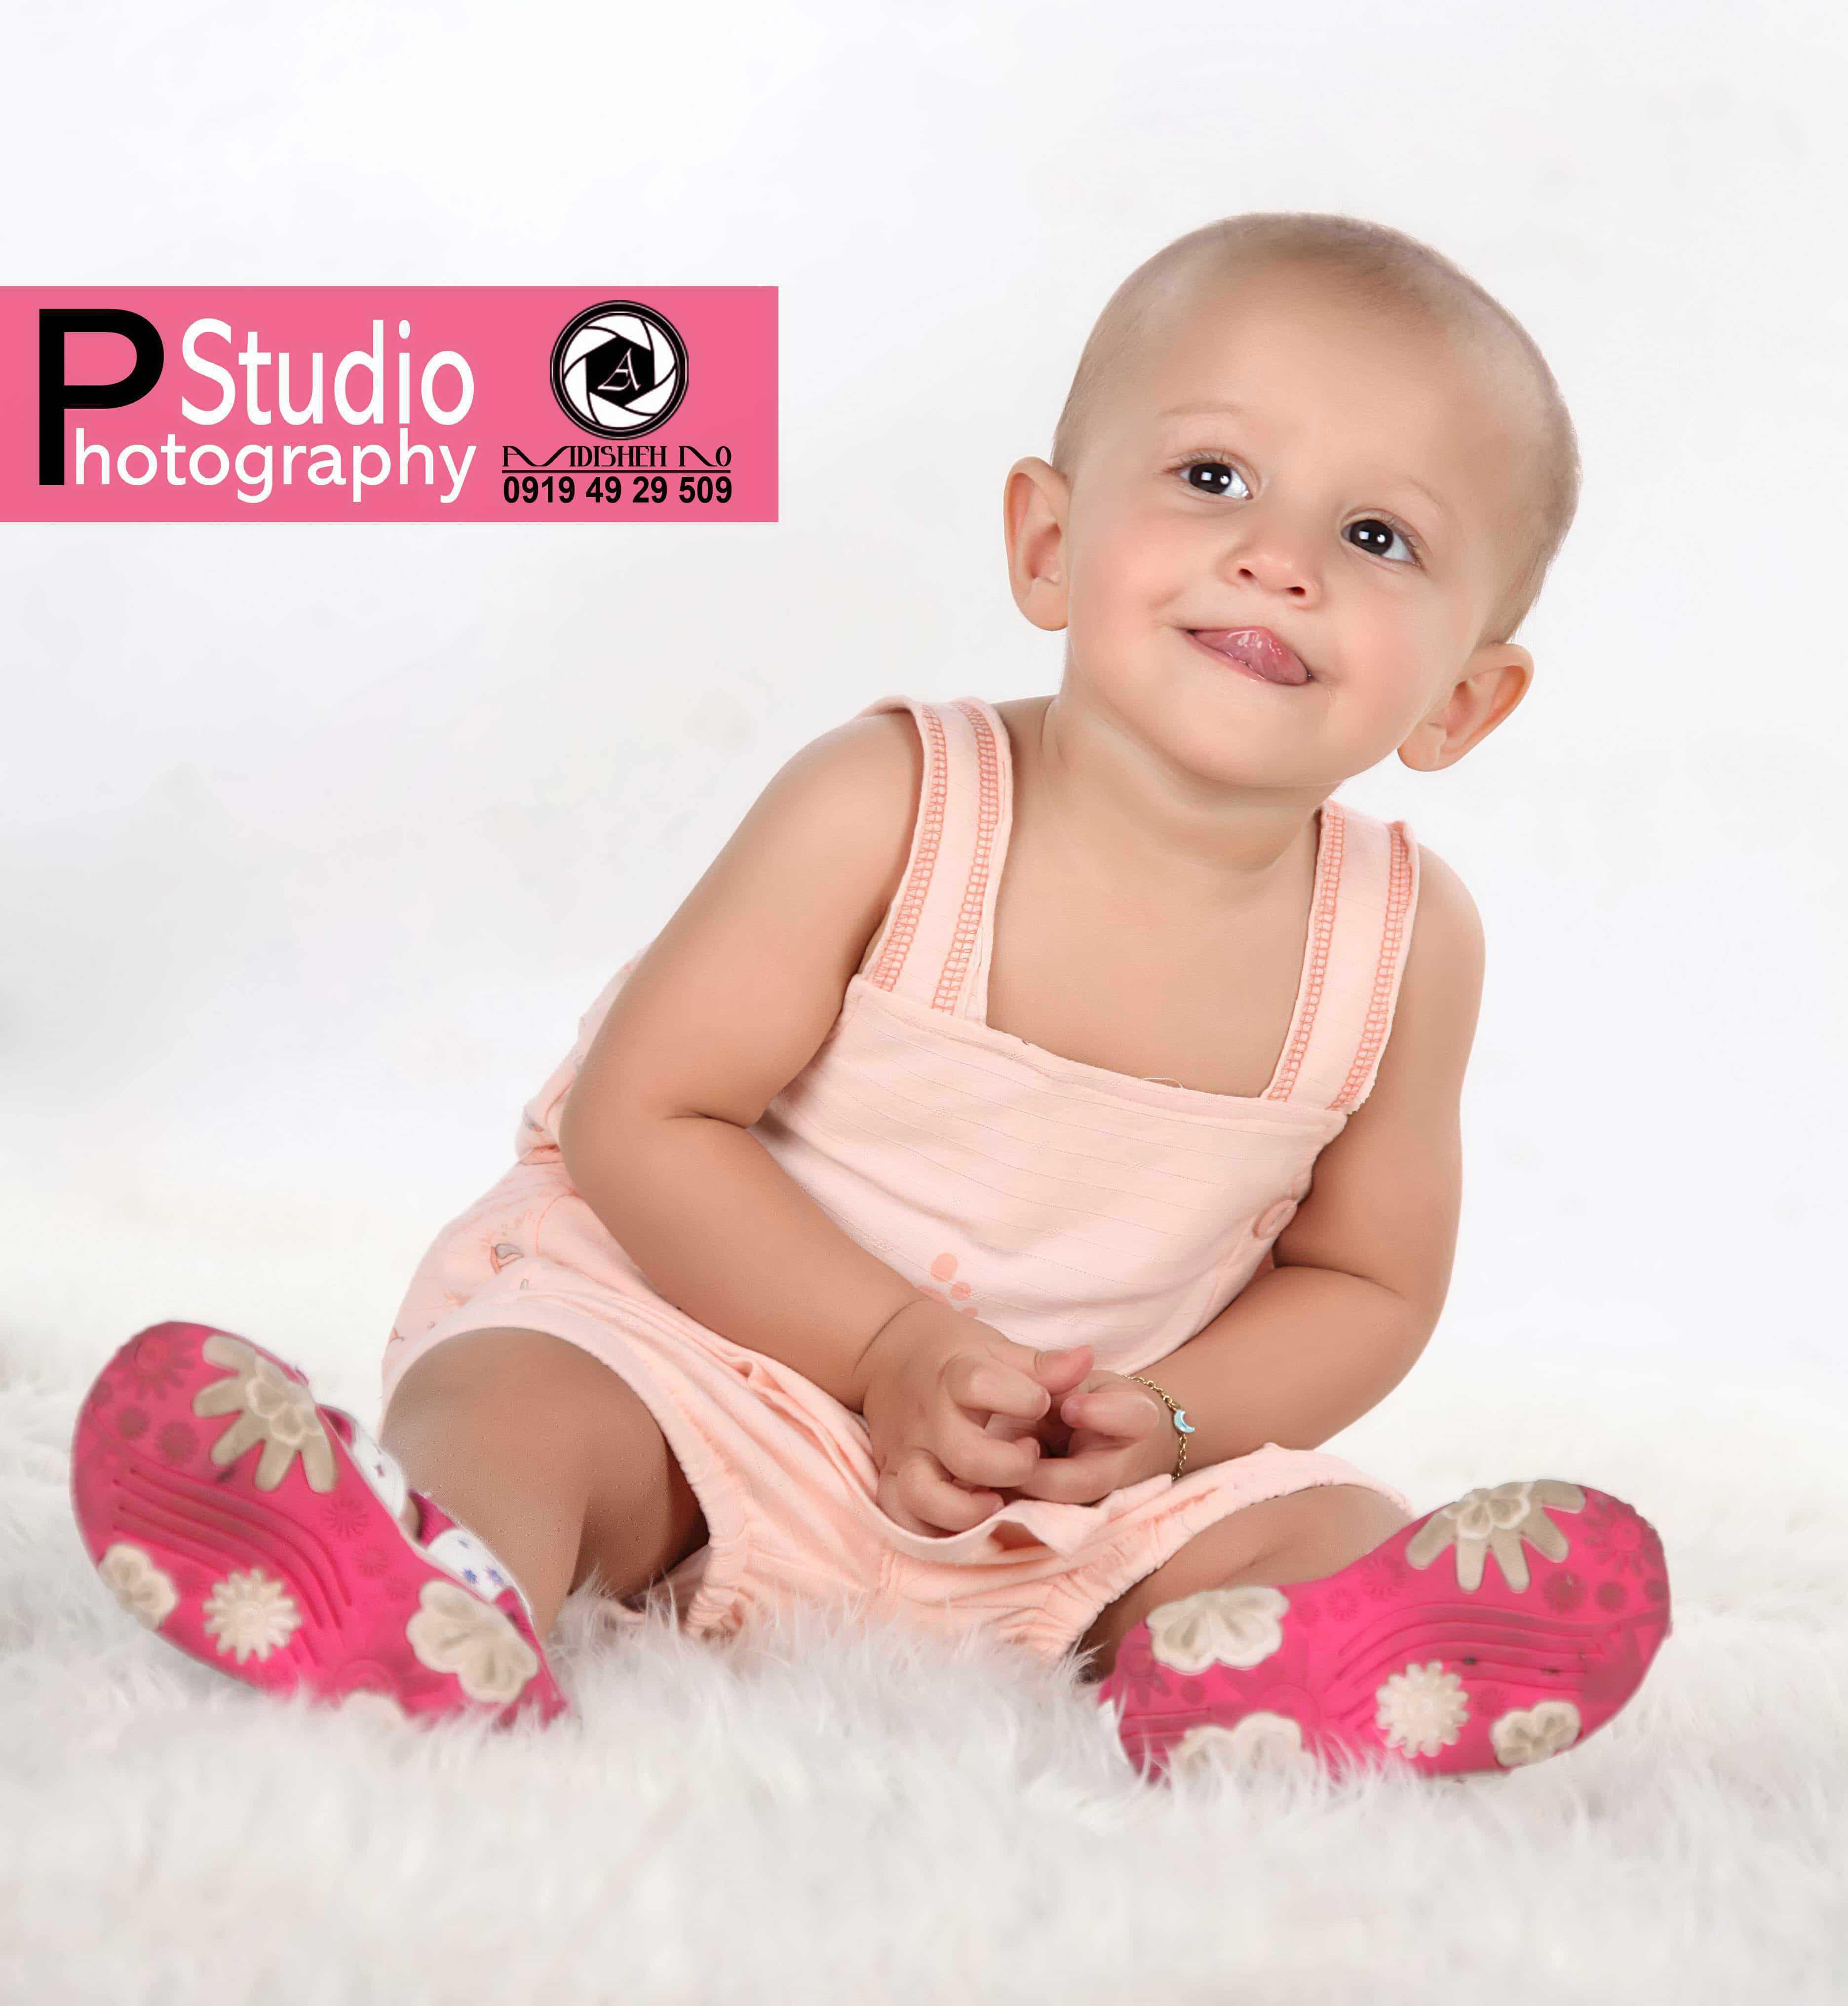 Andisheh No Model 006 - آتلیه عکاسی تخصصی کودک ، نوزاد ، خوردسال ، بچه ، کوچولو با تخفیف ویژه